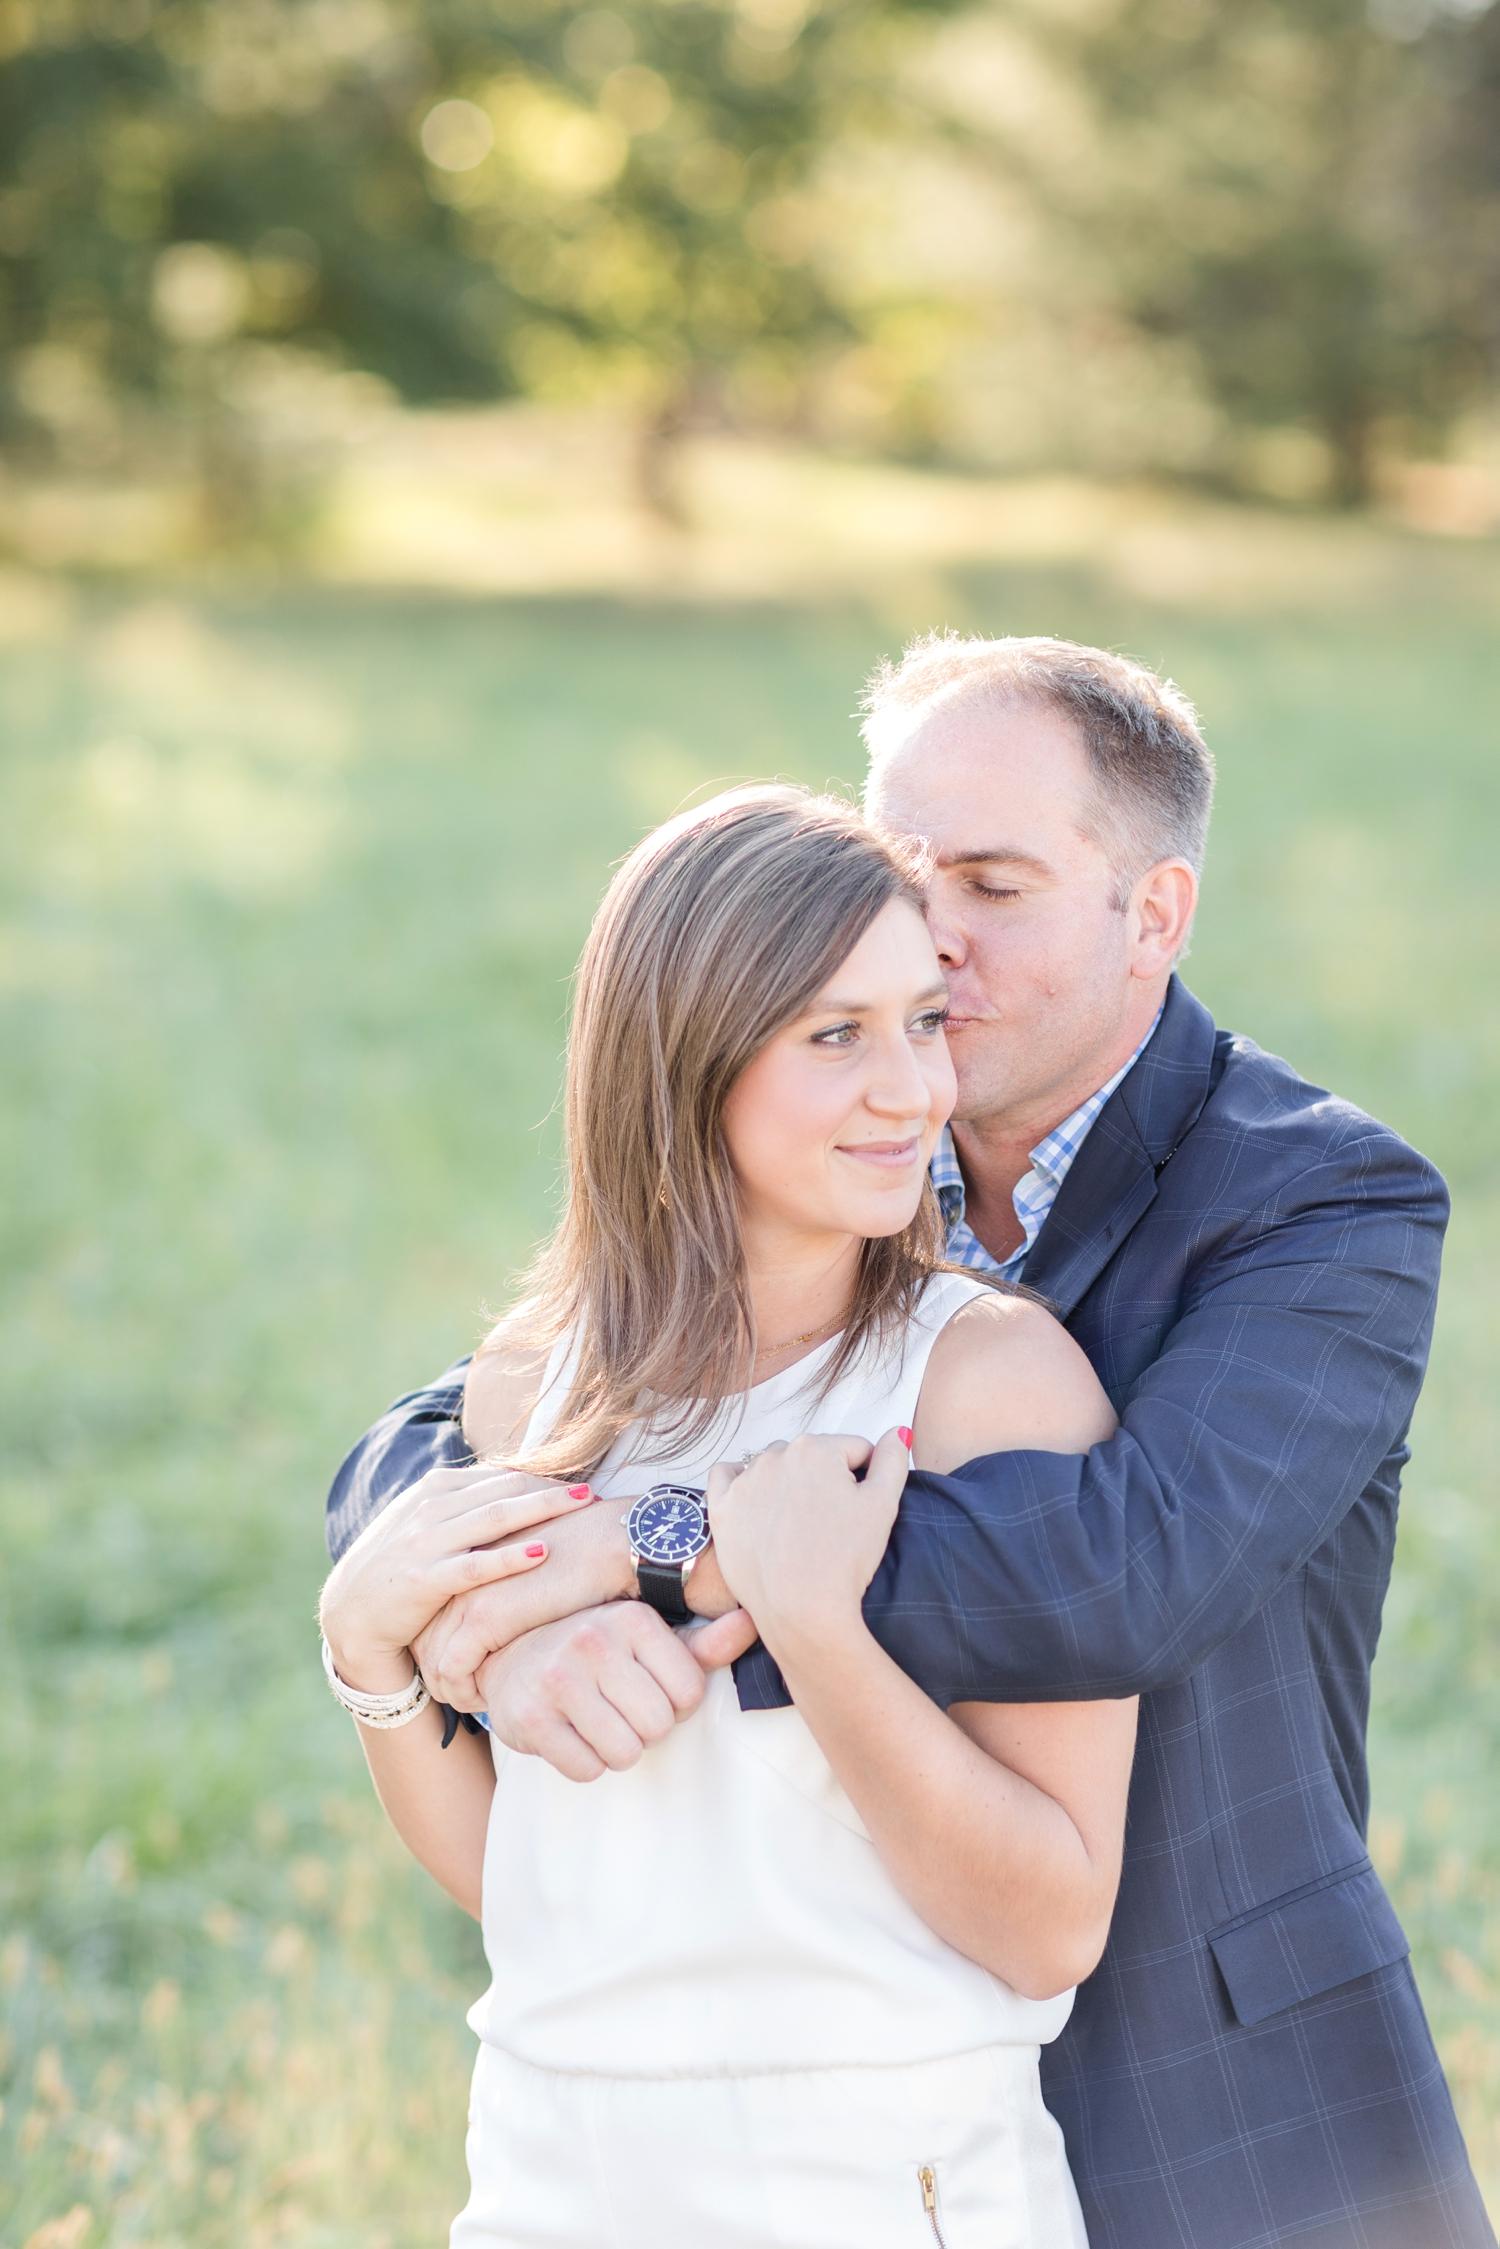 Taylor & Scott Engagement-15_Maryland-engagement-photography-anna-grace-photography-photo.jpg